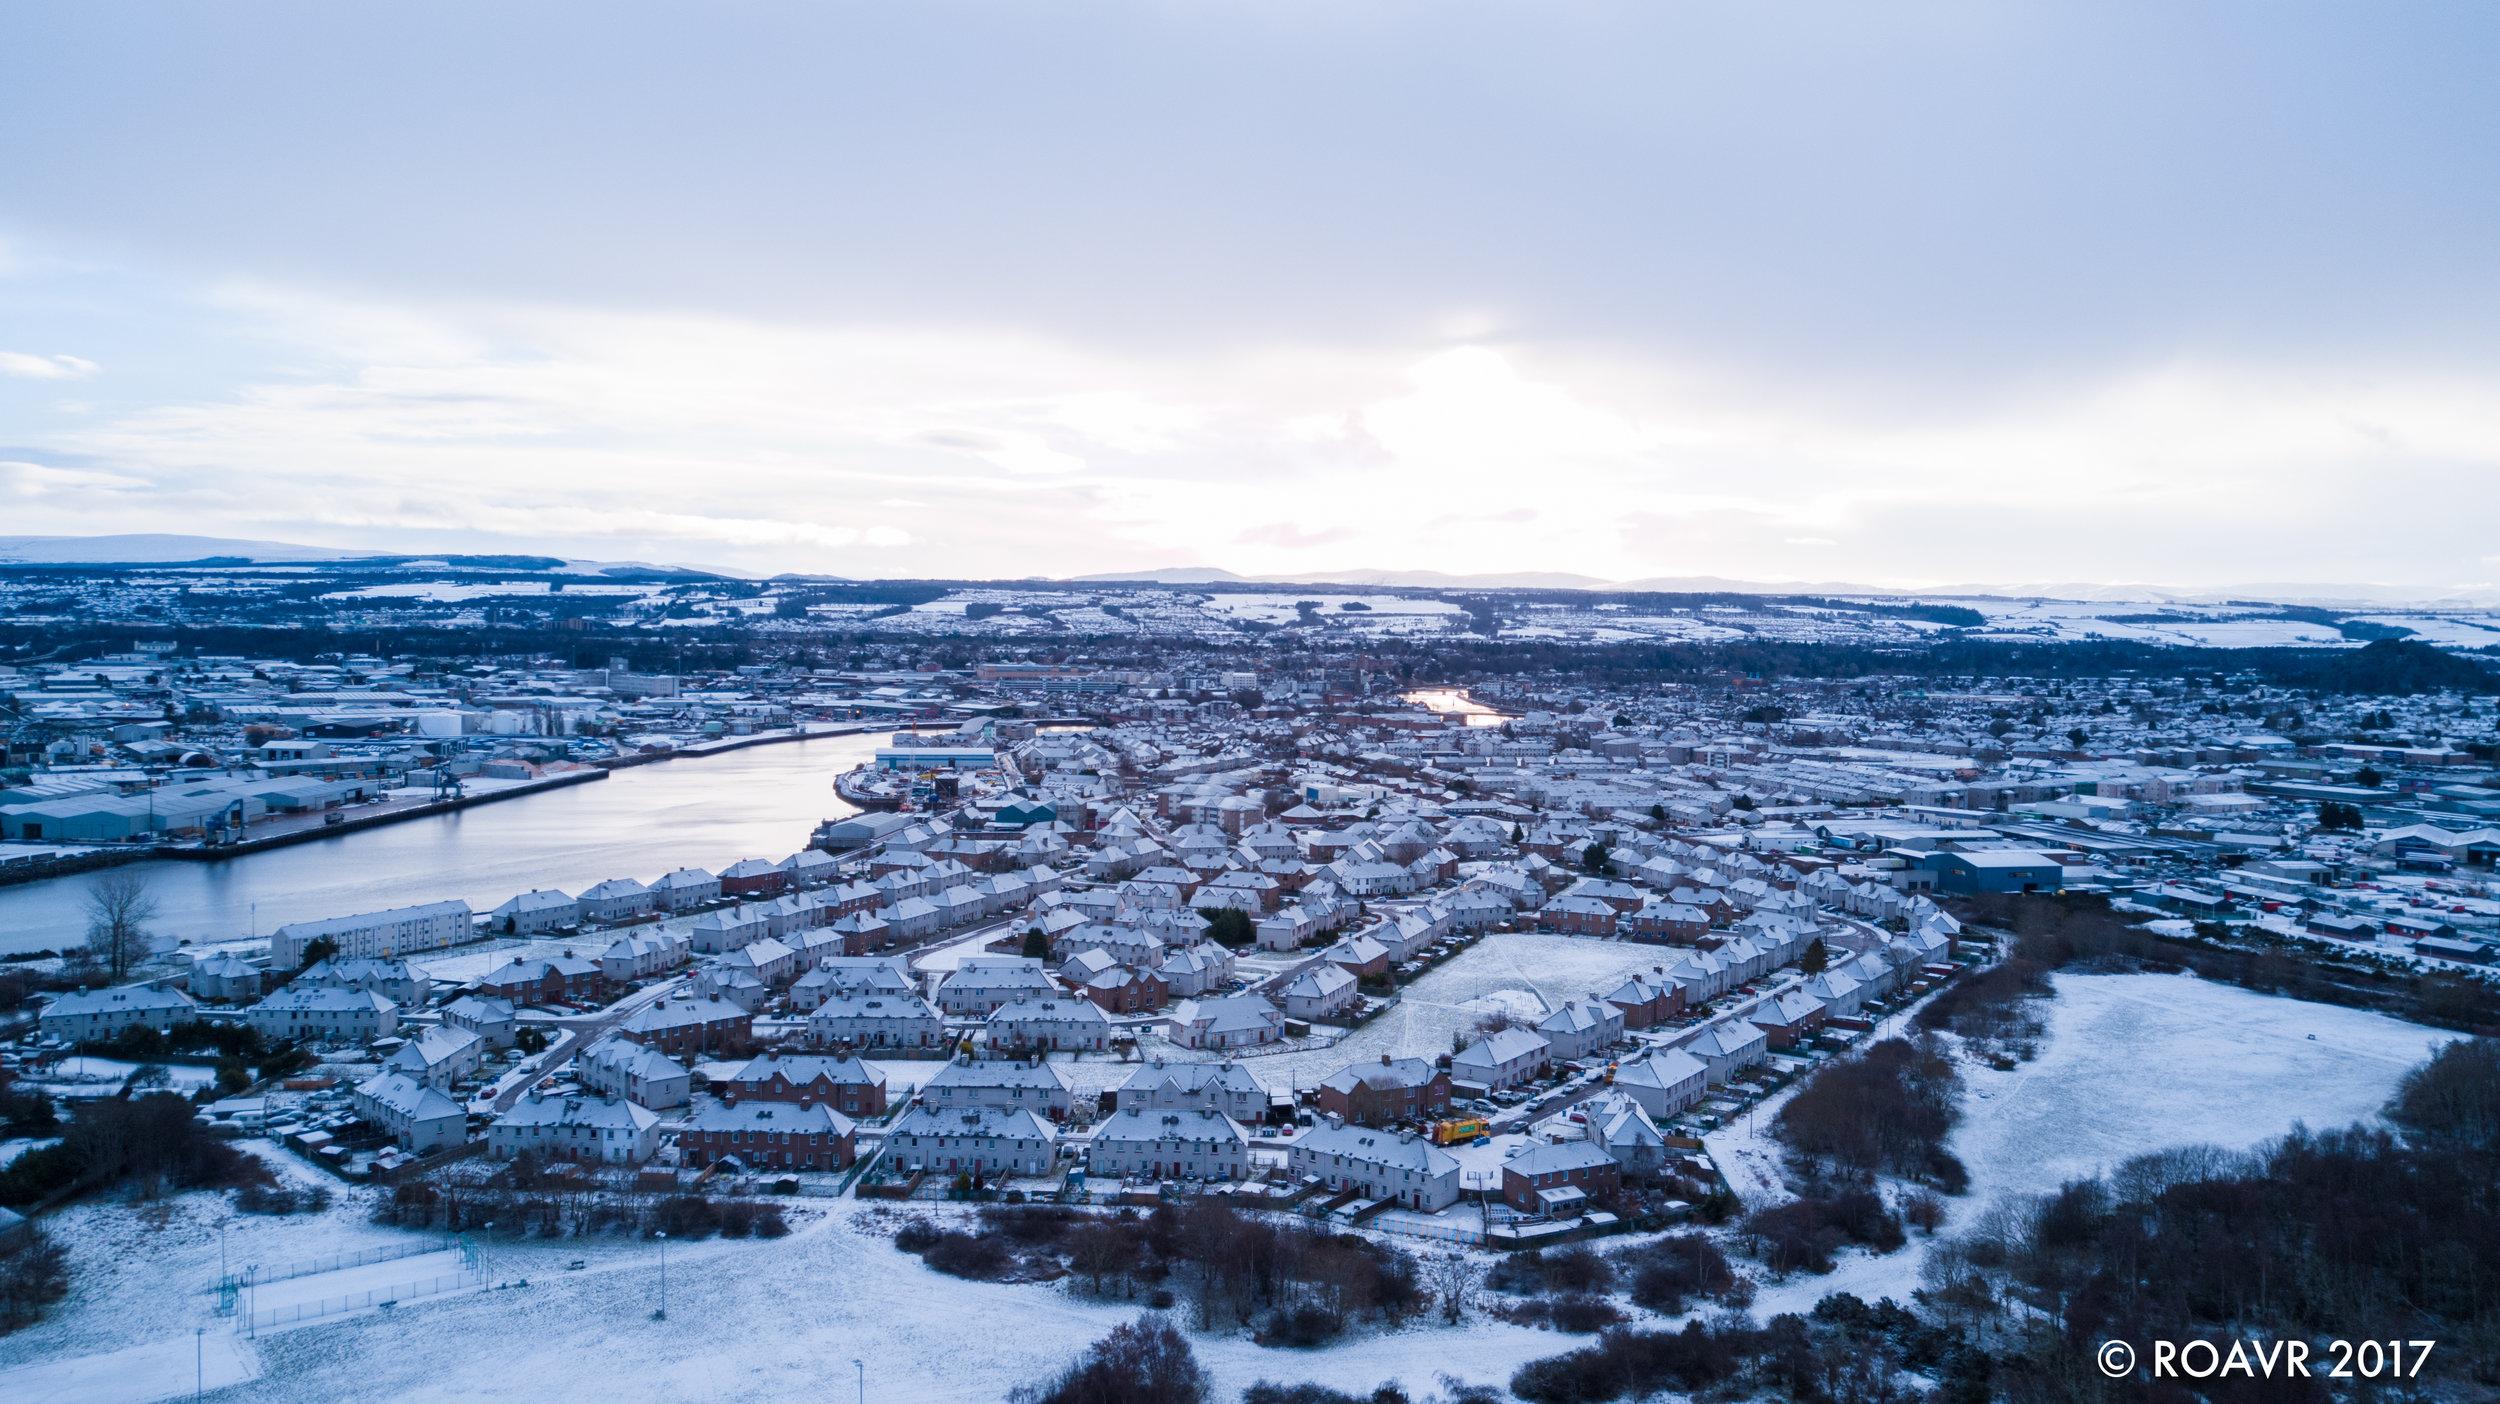 South Kessock - Inverness, January 2018